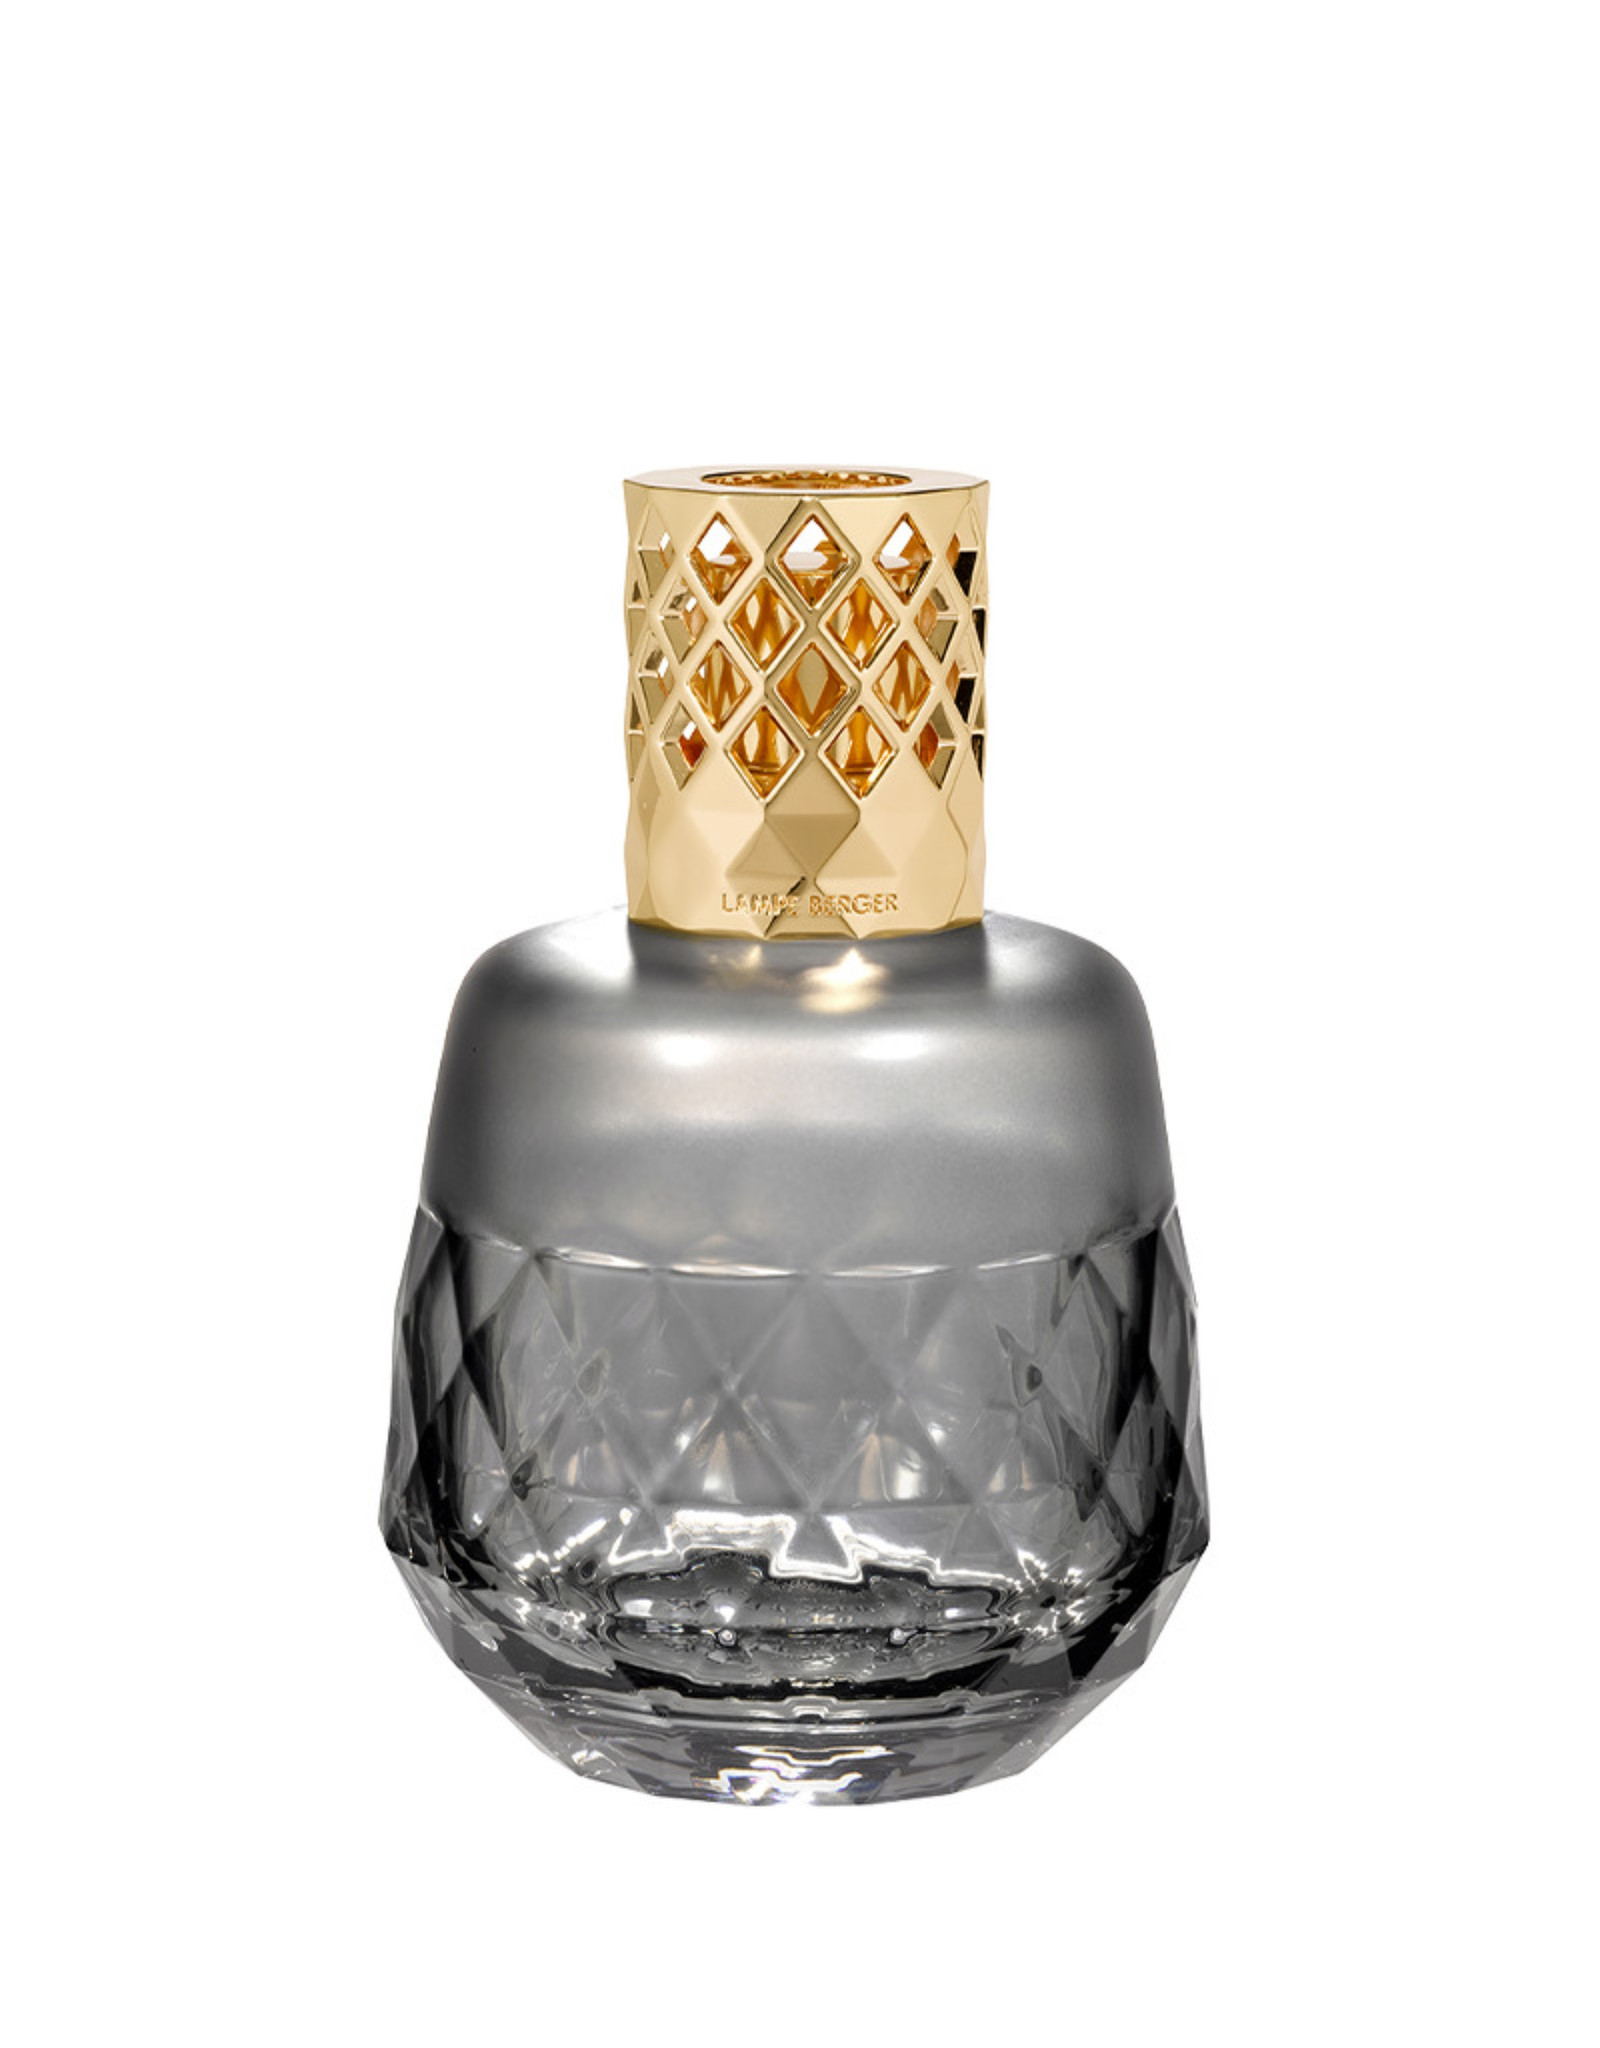 Lampe Berger Geurbrander Clarity - Grijs